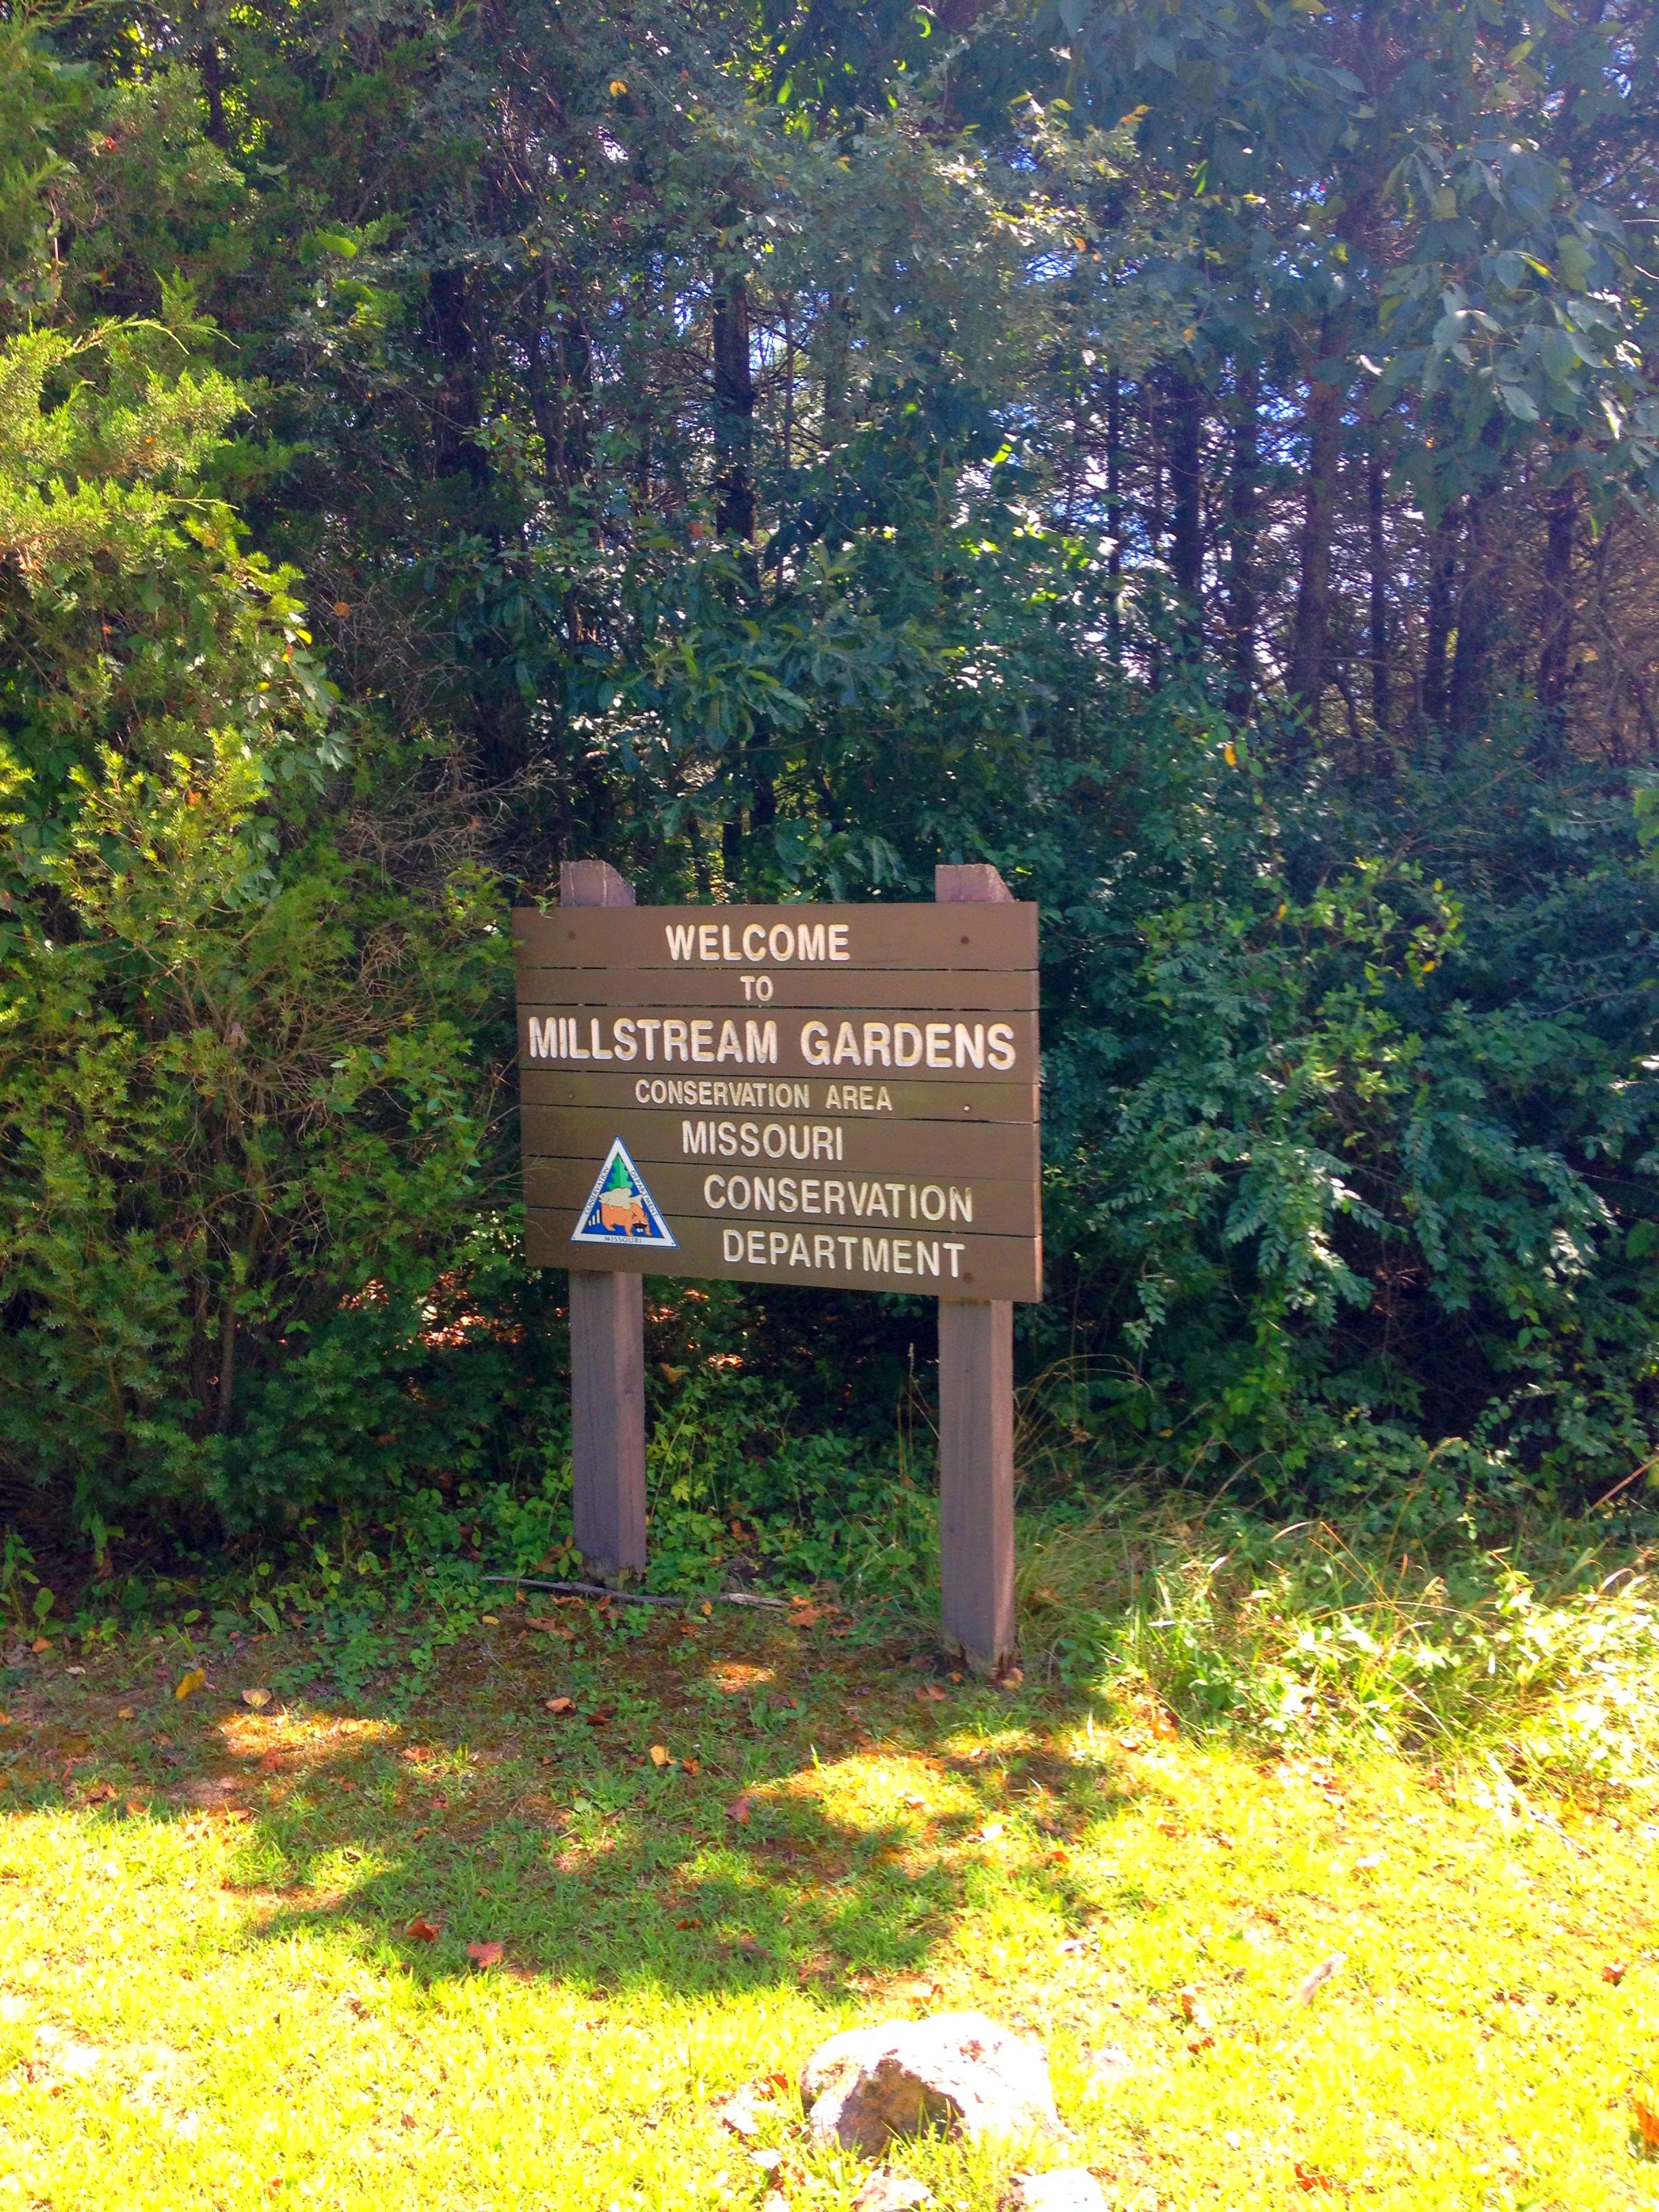 Millstream Gardens Conservation Area Missouri Planned